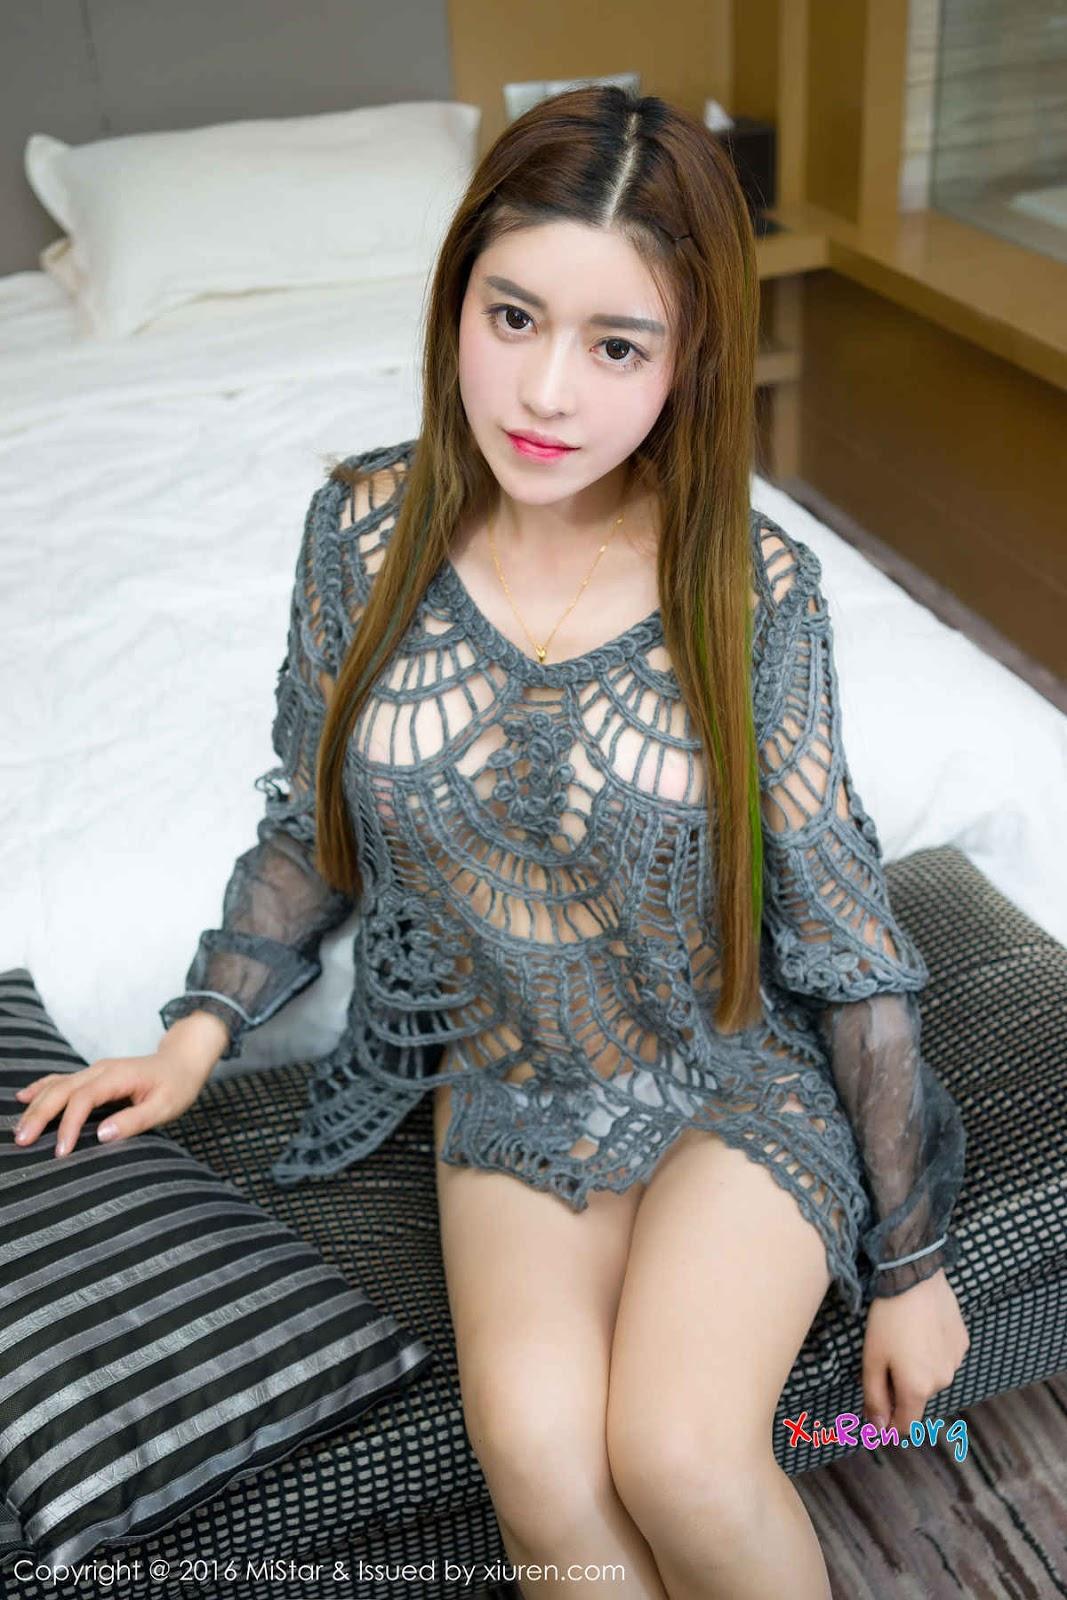 https://1.bp.blogspot.com/-89UO4n32lJk/WHrzxMJliOI/AAAAAAAAO0w/L8DkOpeUru0y2UUprRdTogUGudS8RwasgCLcB/s1600/xinh-sexy-11.jpg